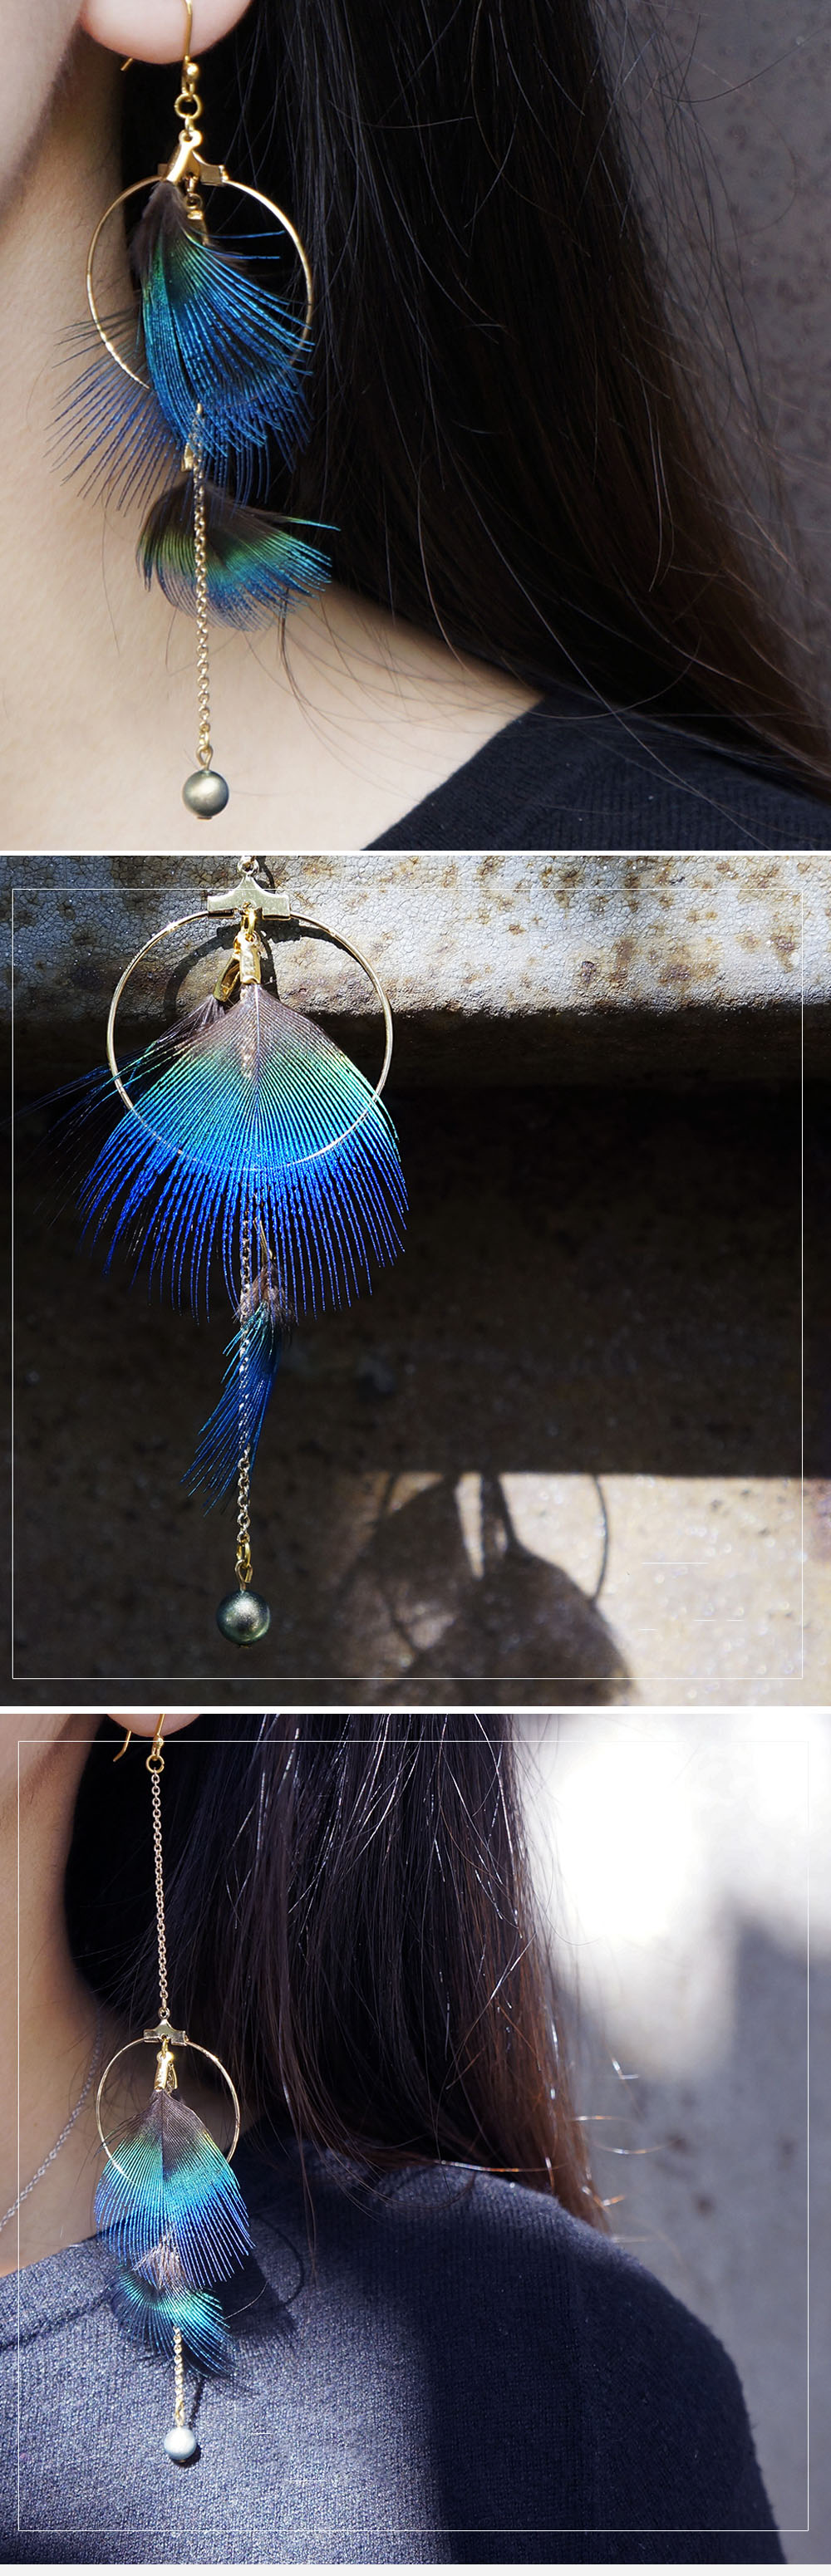 Earing Peckion (Single Ring) Handmade